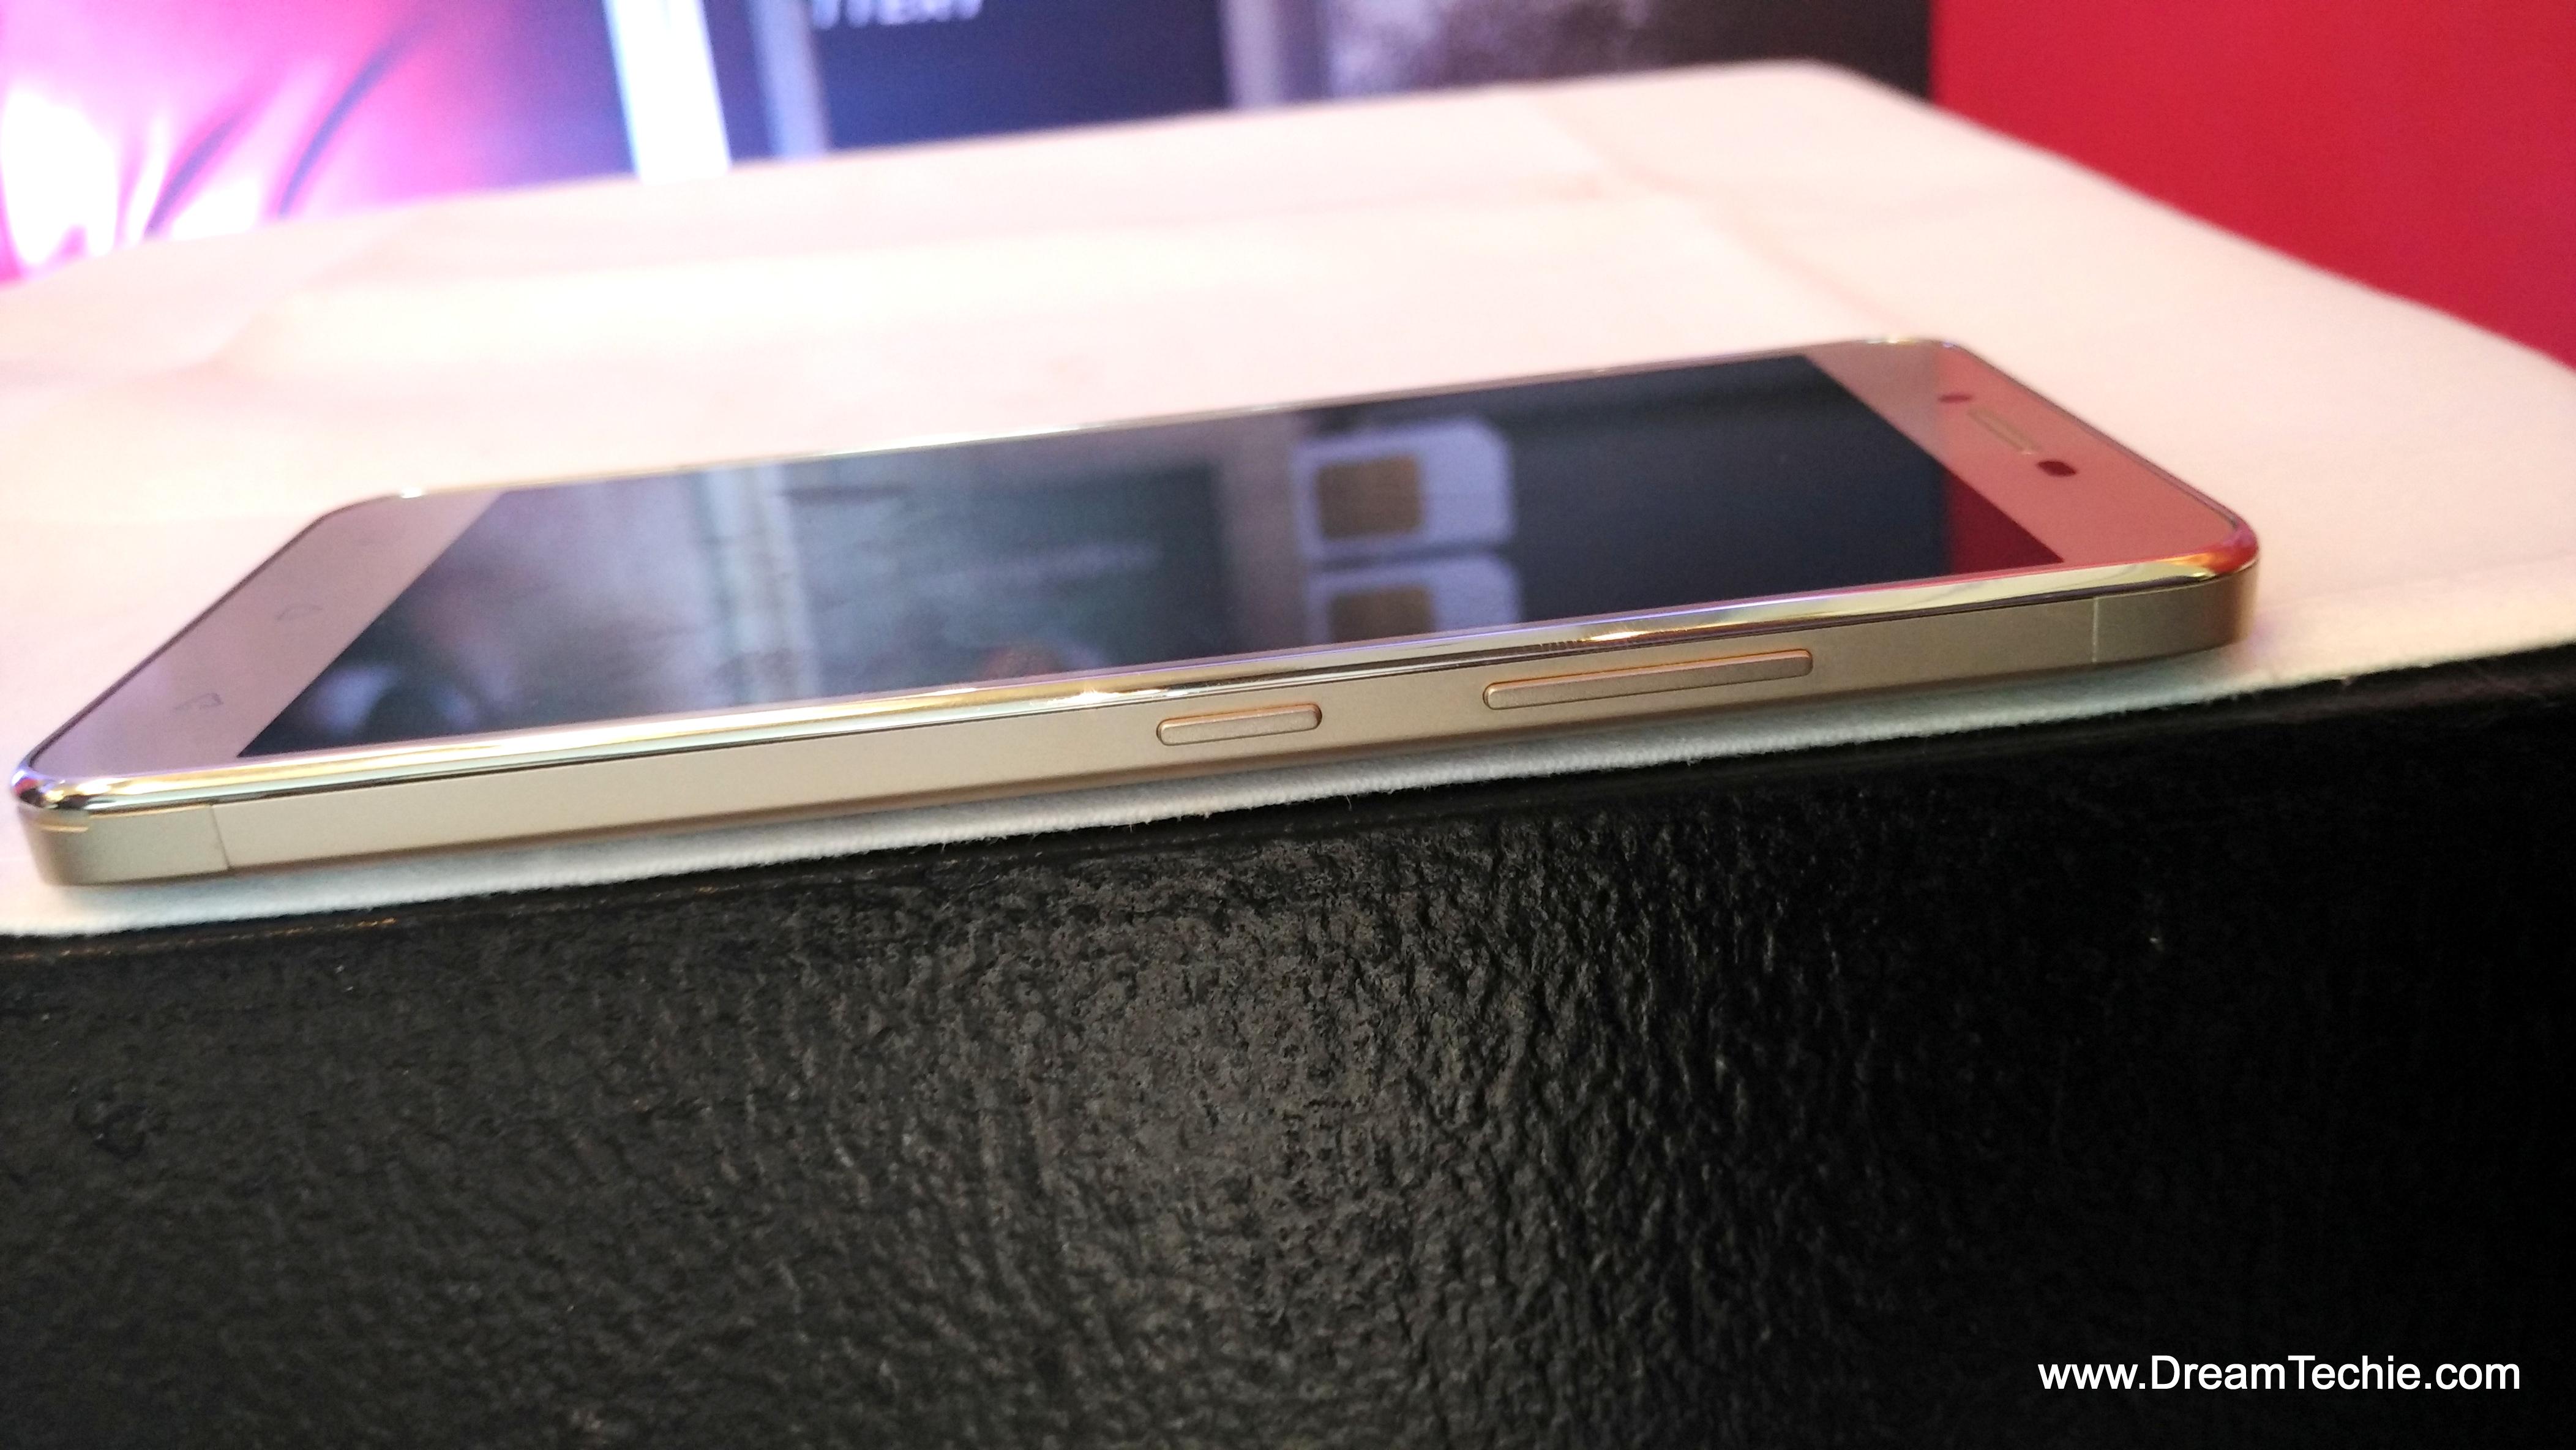 Lenovo Vibe K5 Plus Hands On Pictures Specs Price